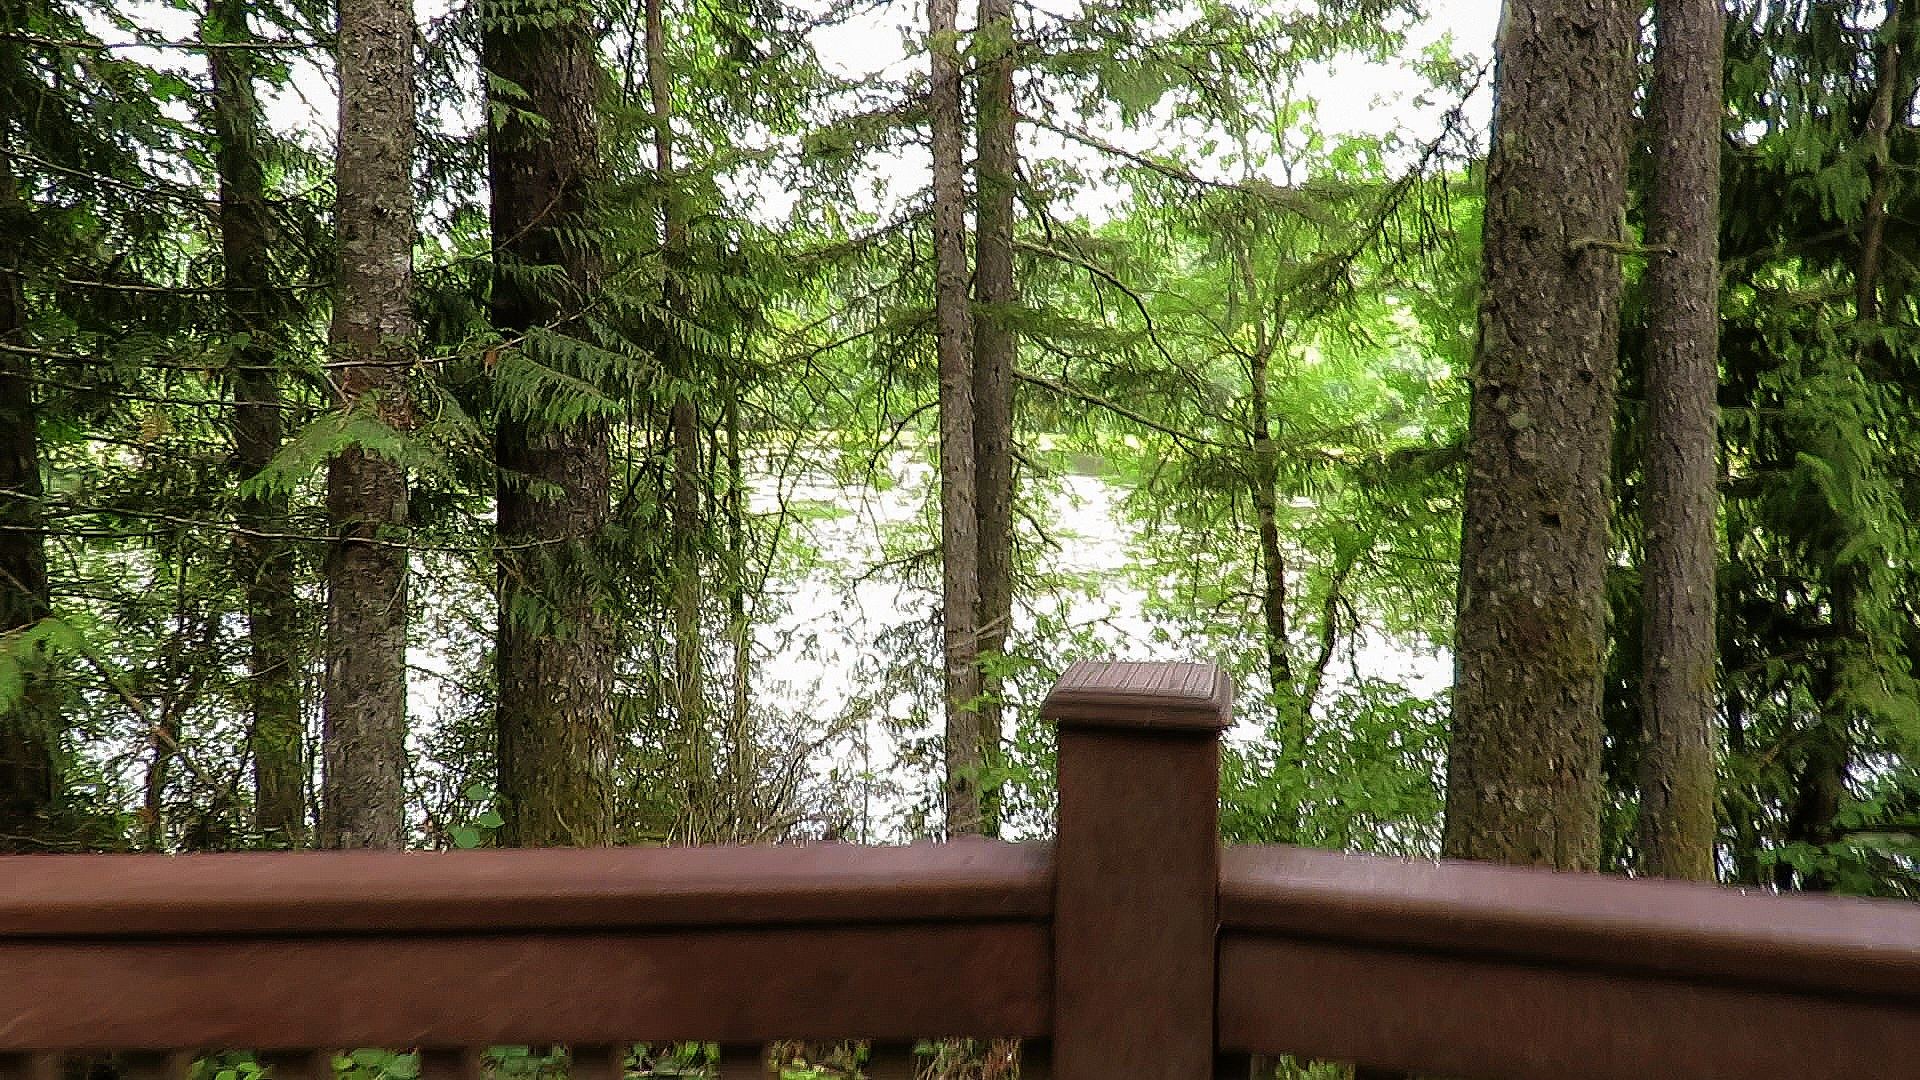 Tradition Lake by JoeHendricks.jpeg